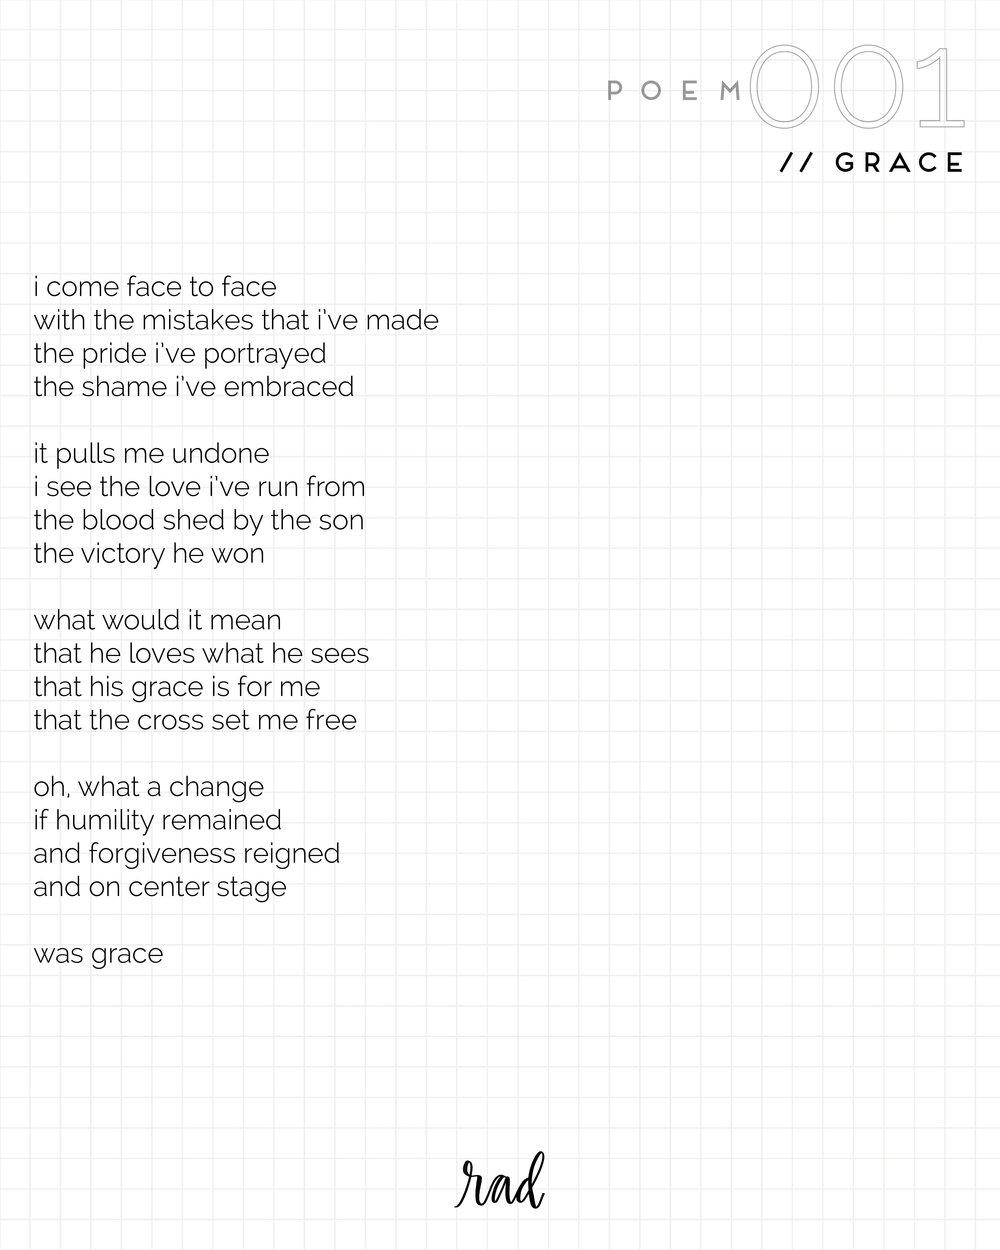 poem001.jpg